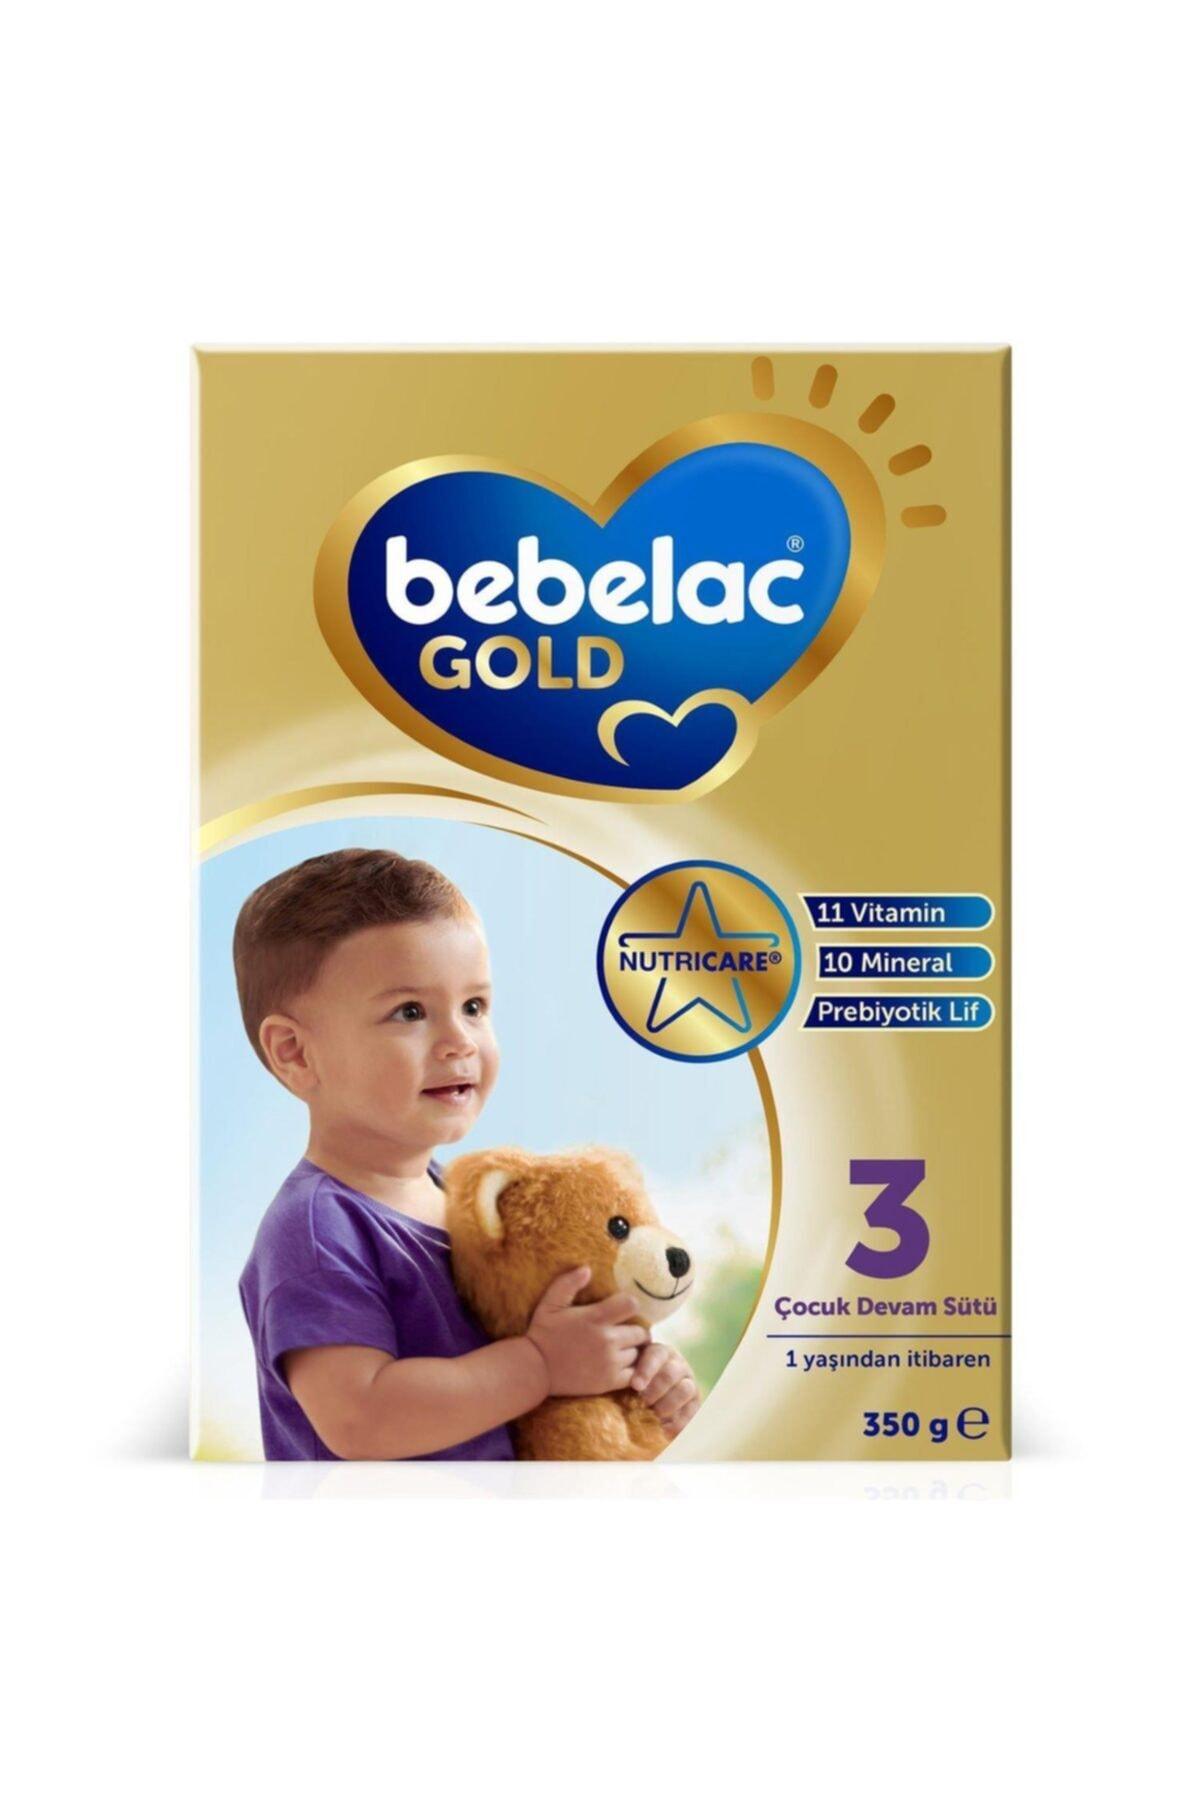 Bebelac Gold 3 Devam Sütü 350 gr 1